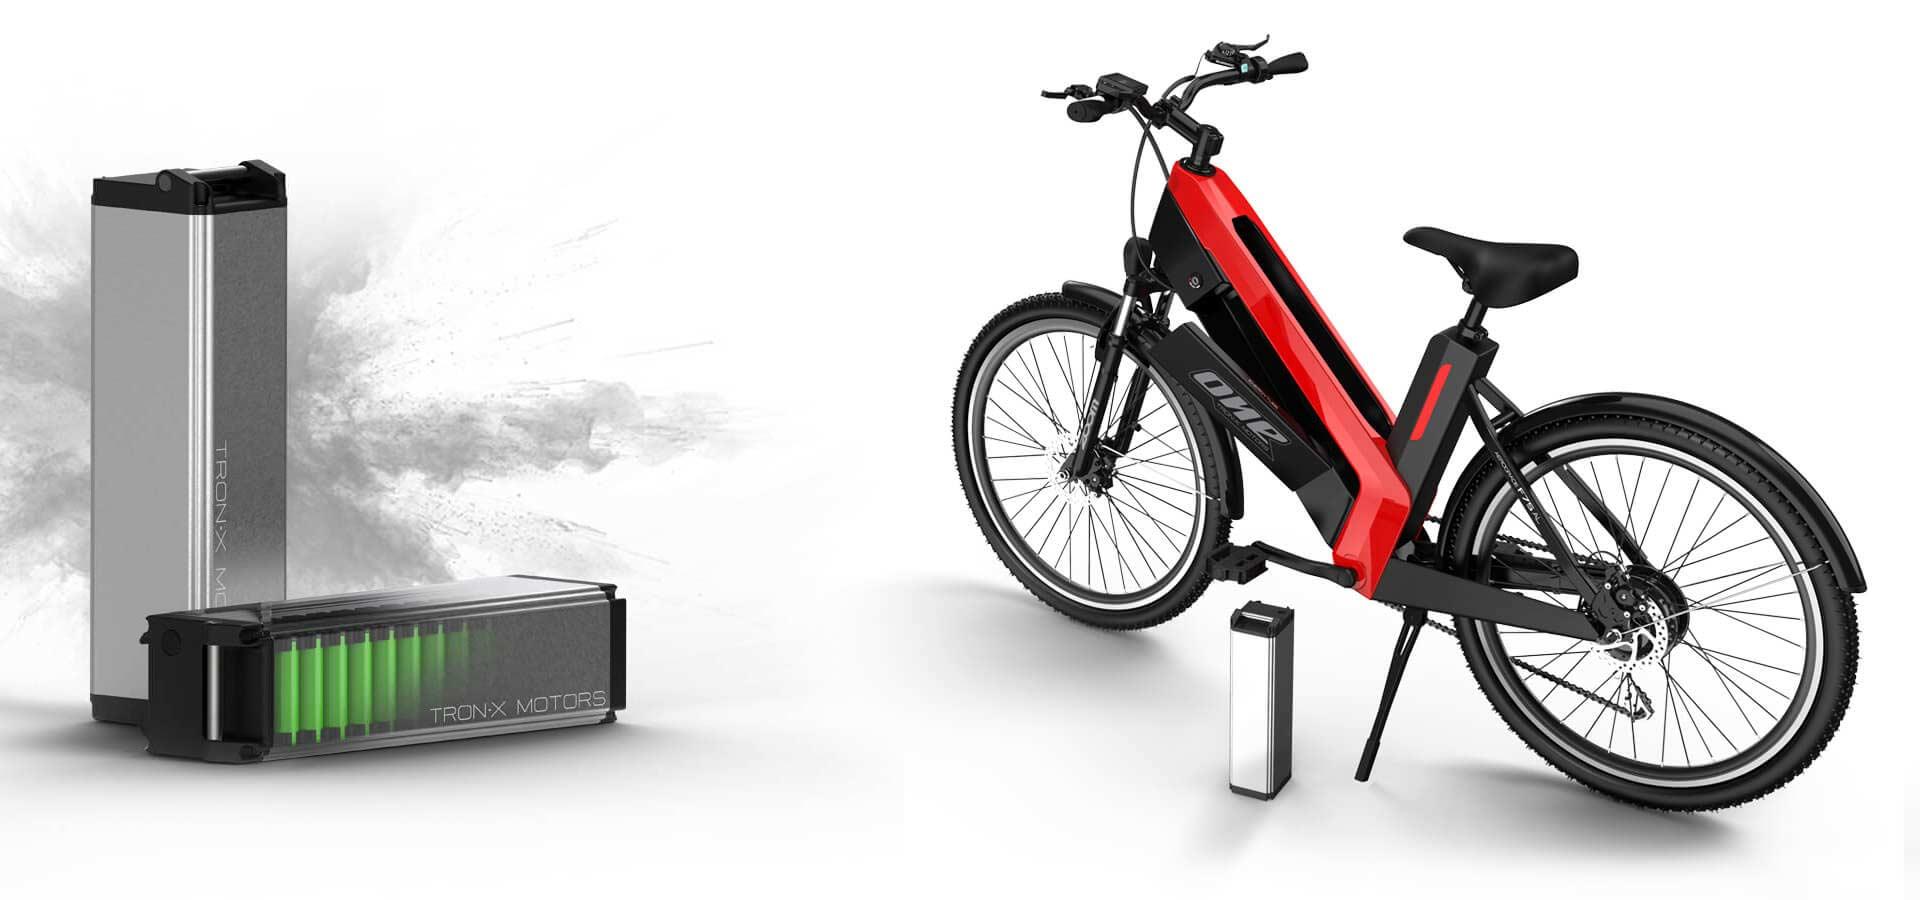 Tronx-One-Electric-Bike_4